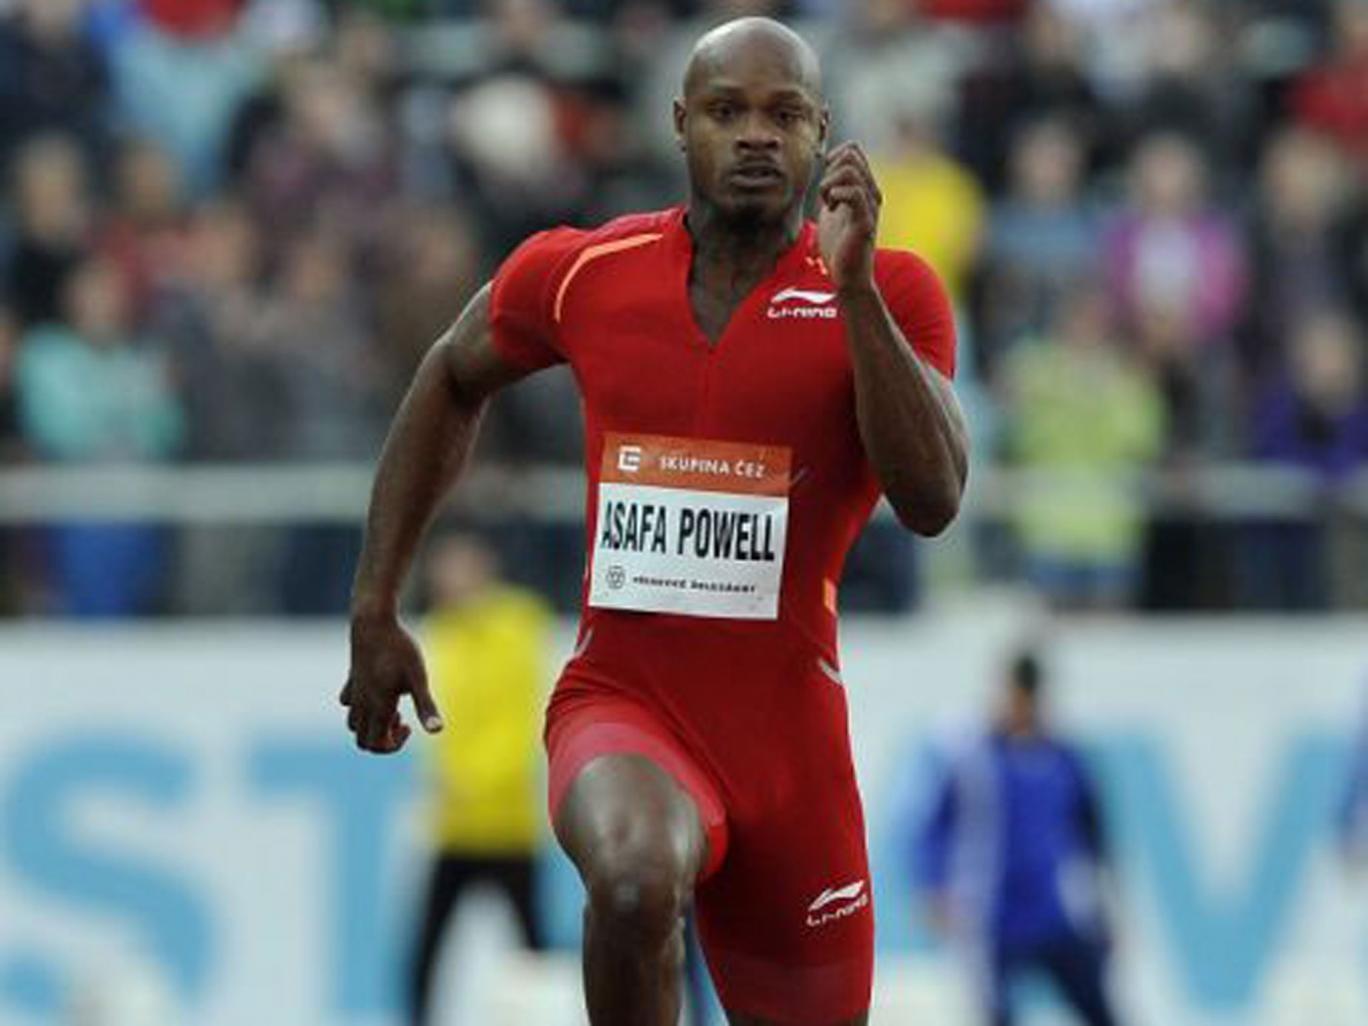 Asafa Powell has blamed his failed test on a supplement